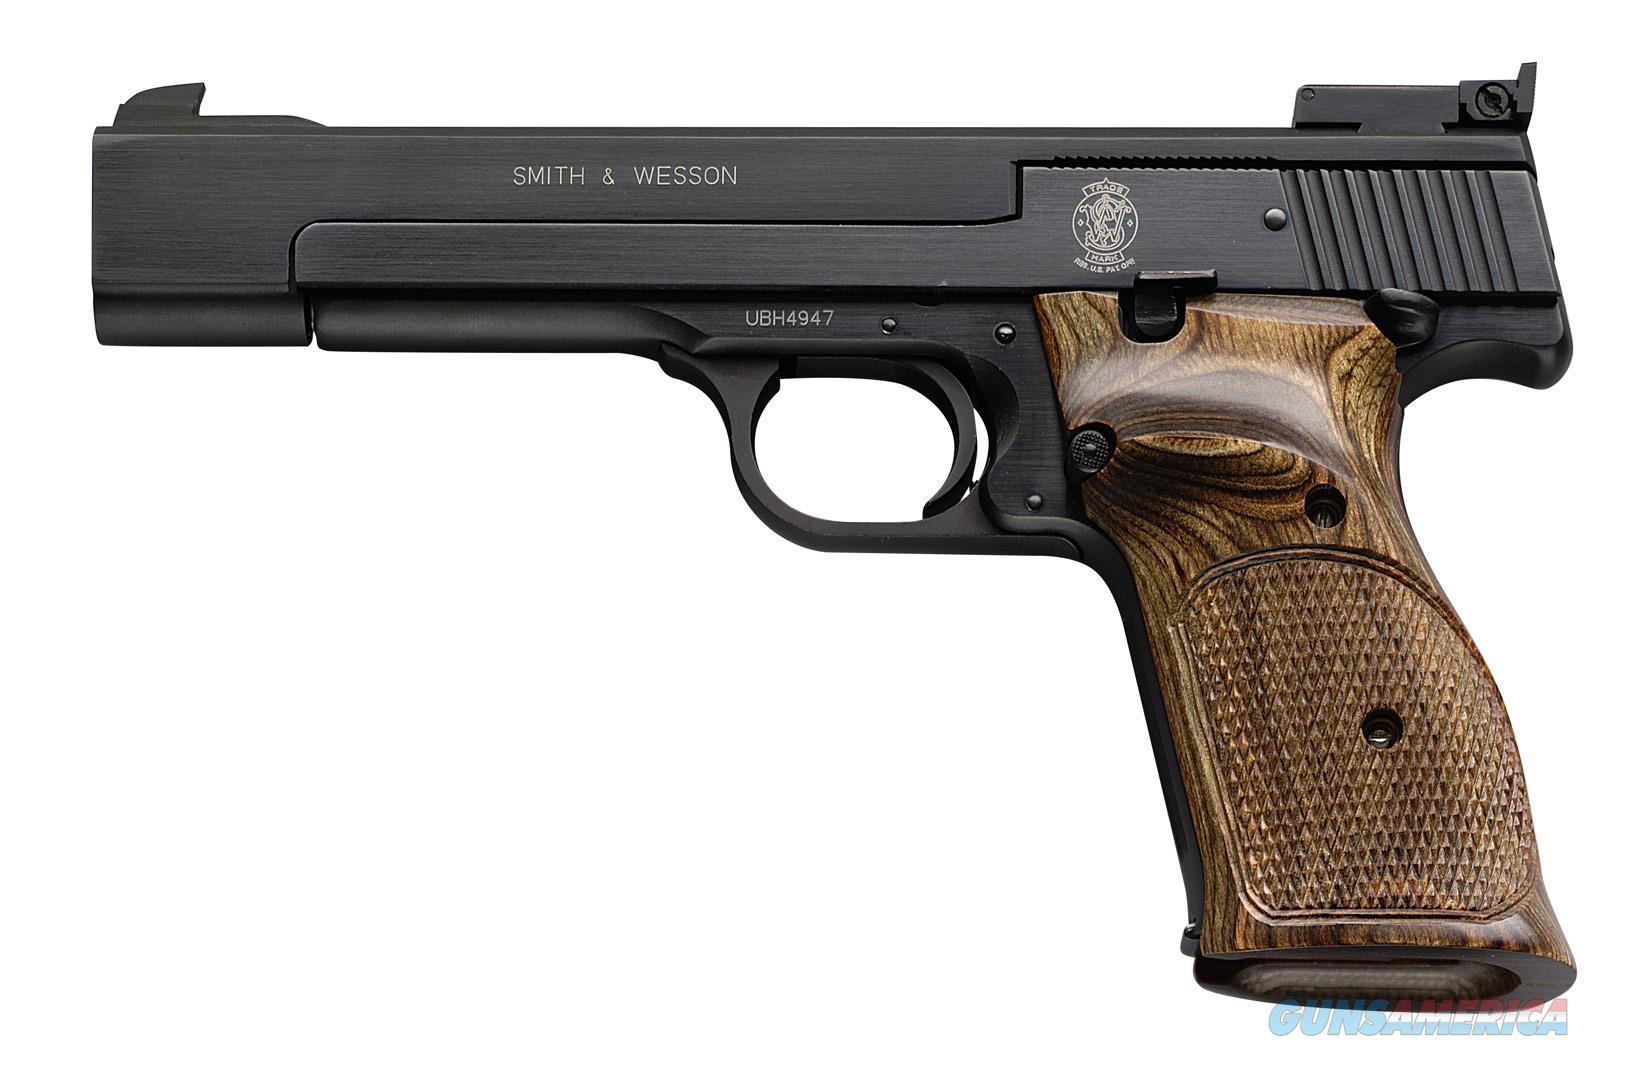 Smith & Wesson Model 41 130511  Guns > Pistols > Smith & Wesson Pistols - Autos > .22 Autos